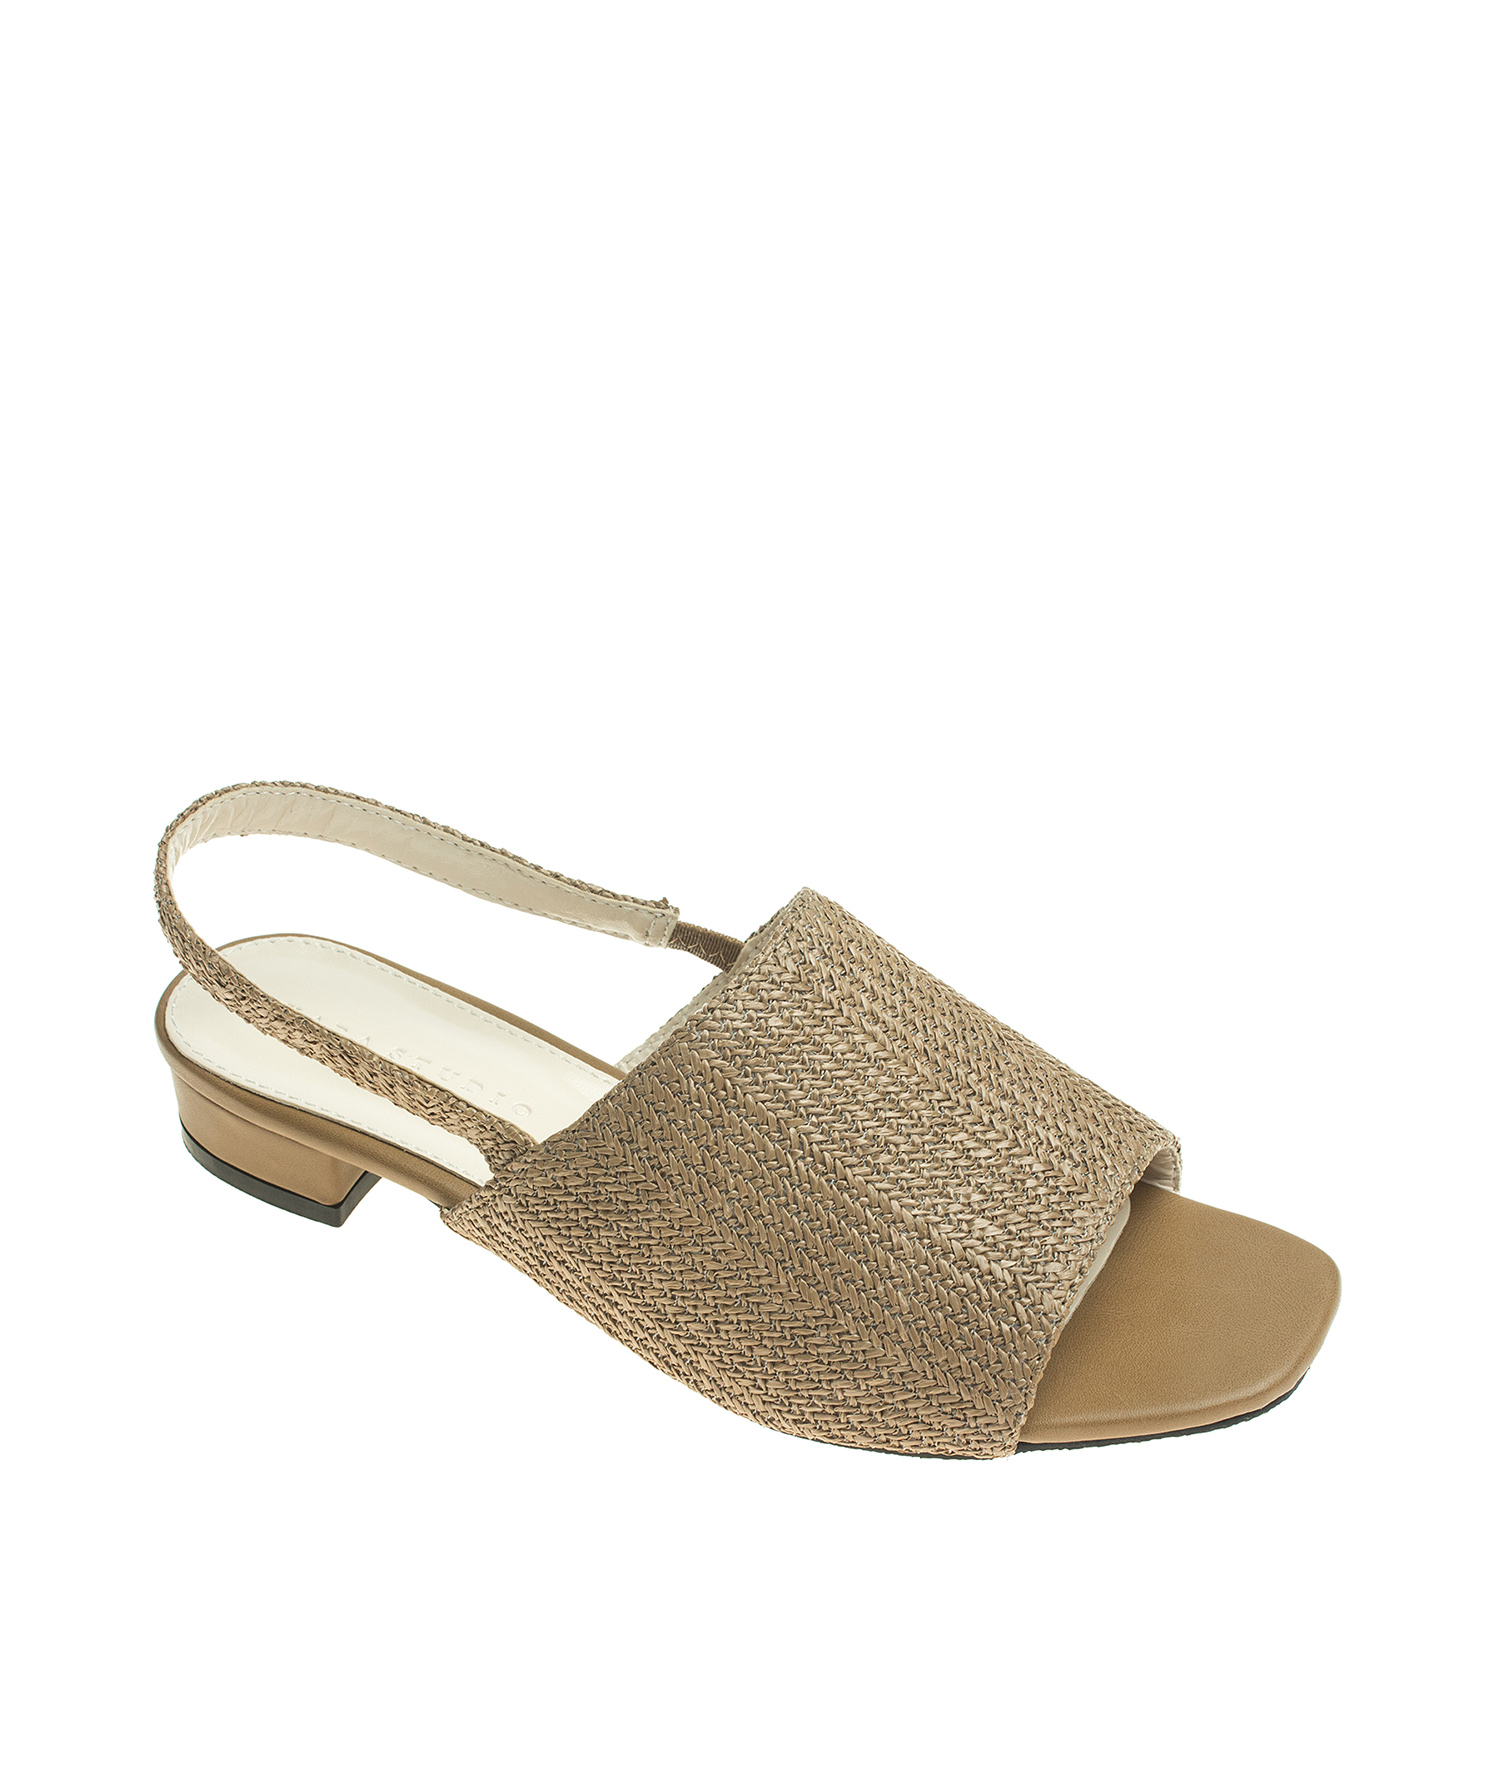 39c1e7e6ad412 AnnaKastle Womens Natural Color Open Toe Woven Slingback Flat Mule Sandals  LightBrown